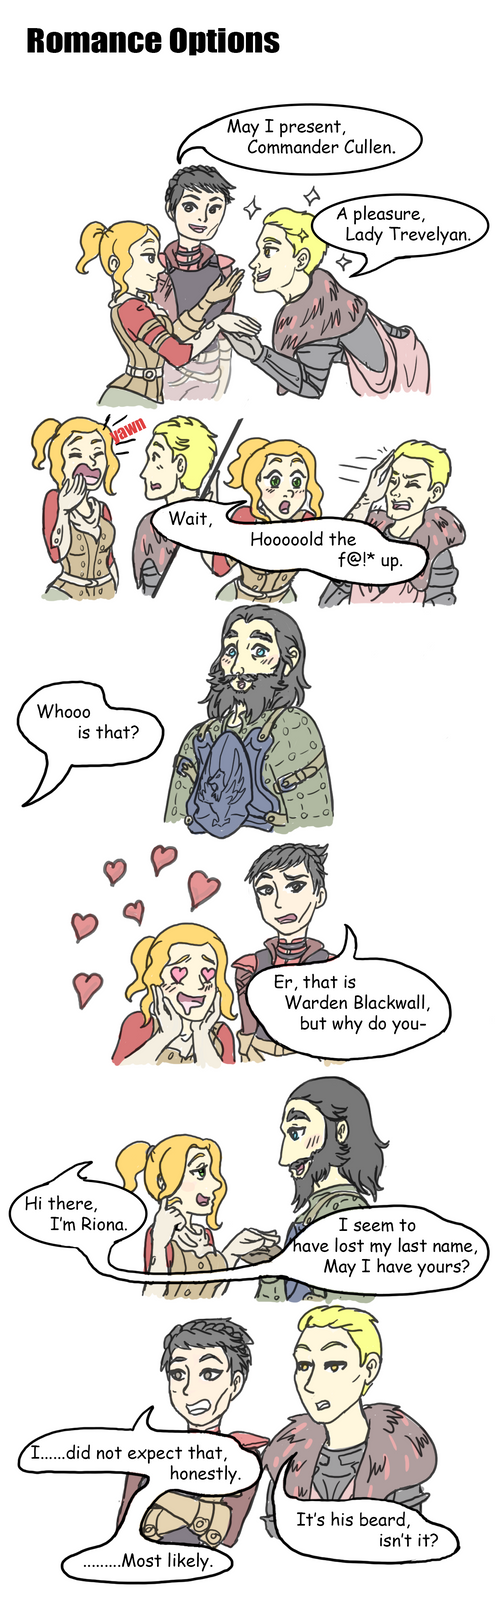 Inquisition Romance Options by JessieReigne